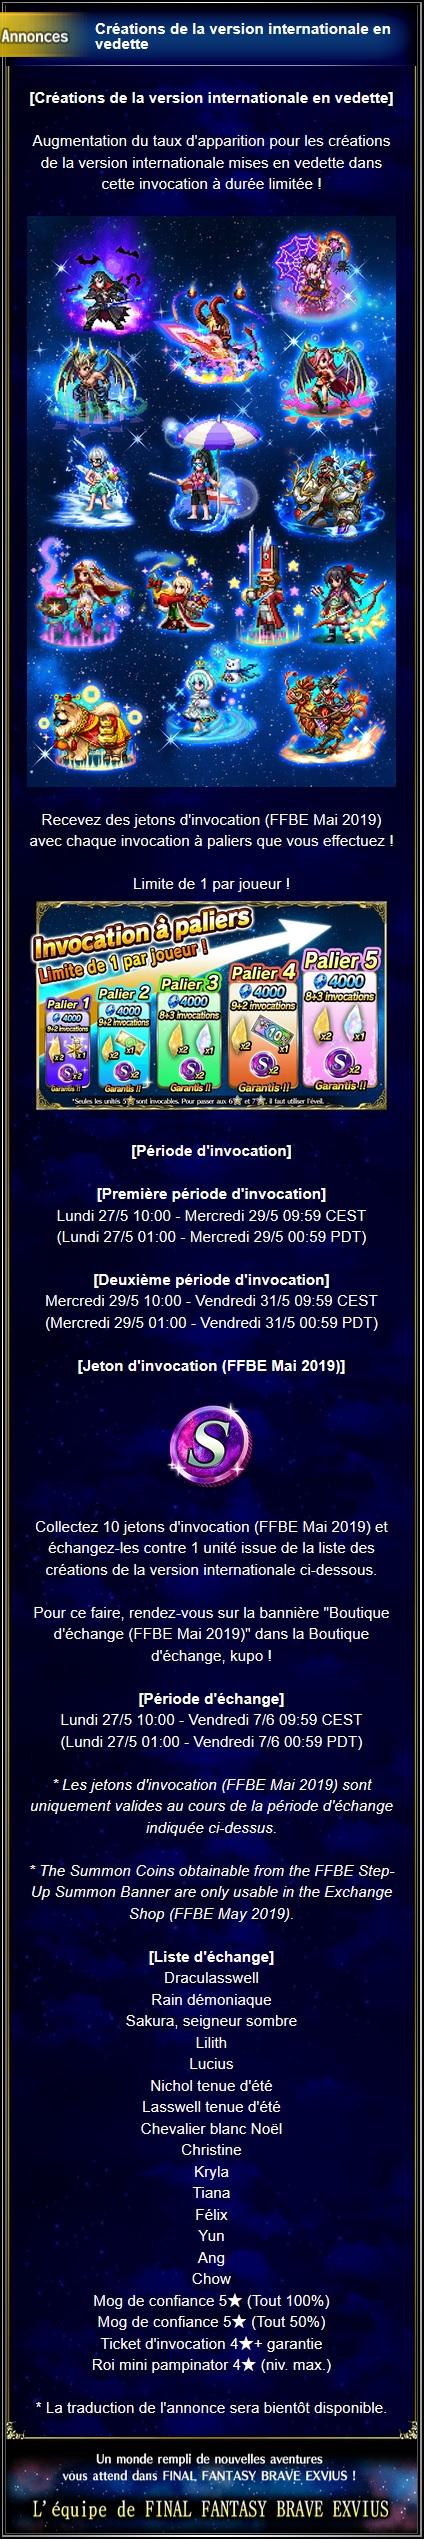 Invocations du moment - FFBE (GLEX) - du 27/05 au 31/05/19 Captu151